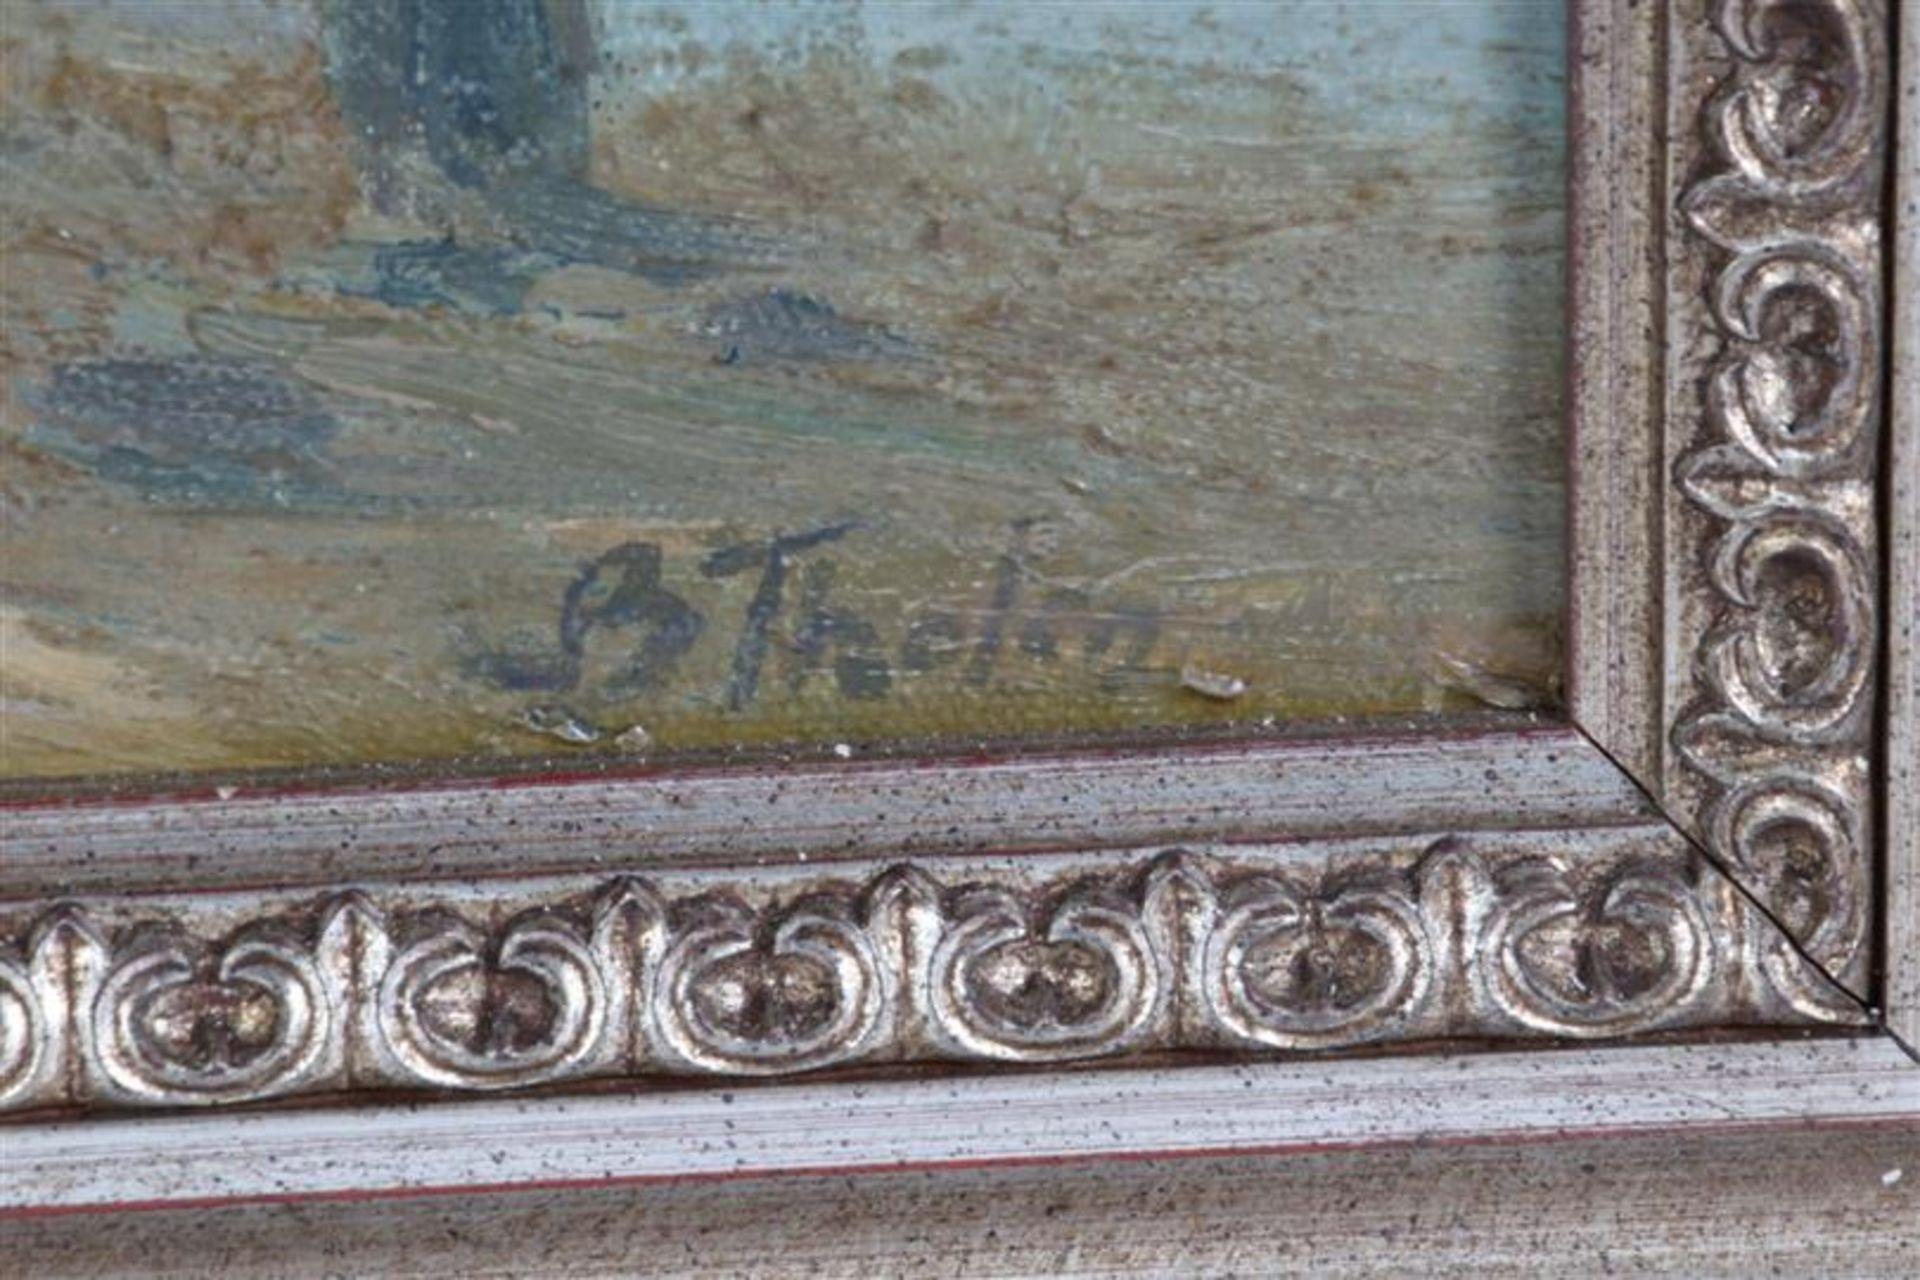 Los 12 - Marouflé 'Strandgezicht', gesigneerd B. Tholen. HxB: 46.5 x 58 cm.